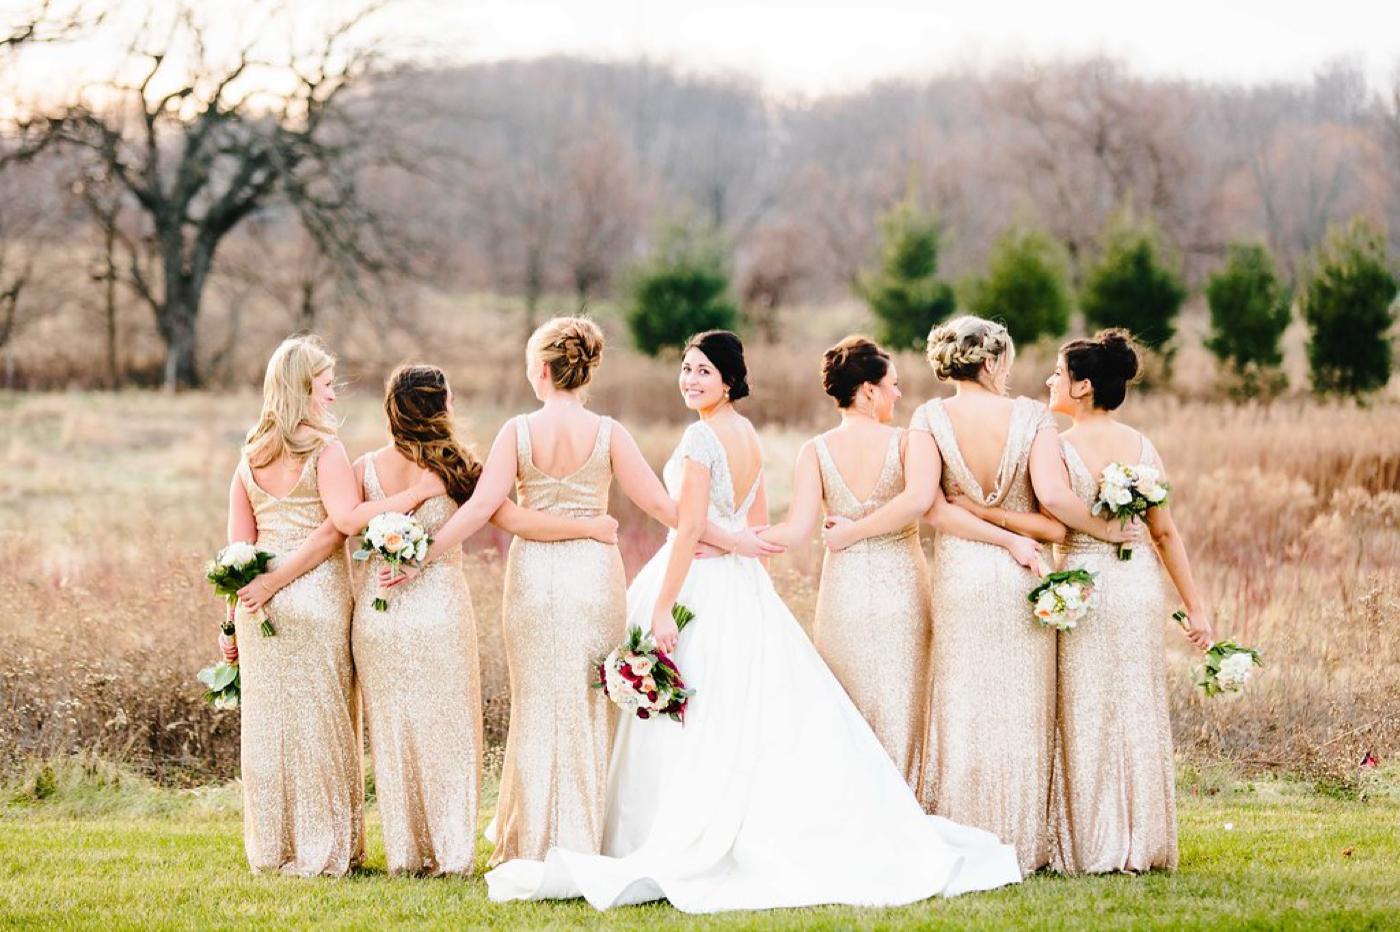 chicago-fine-art-wedding-photography-jacobs4